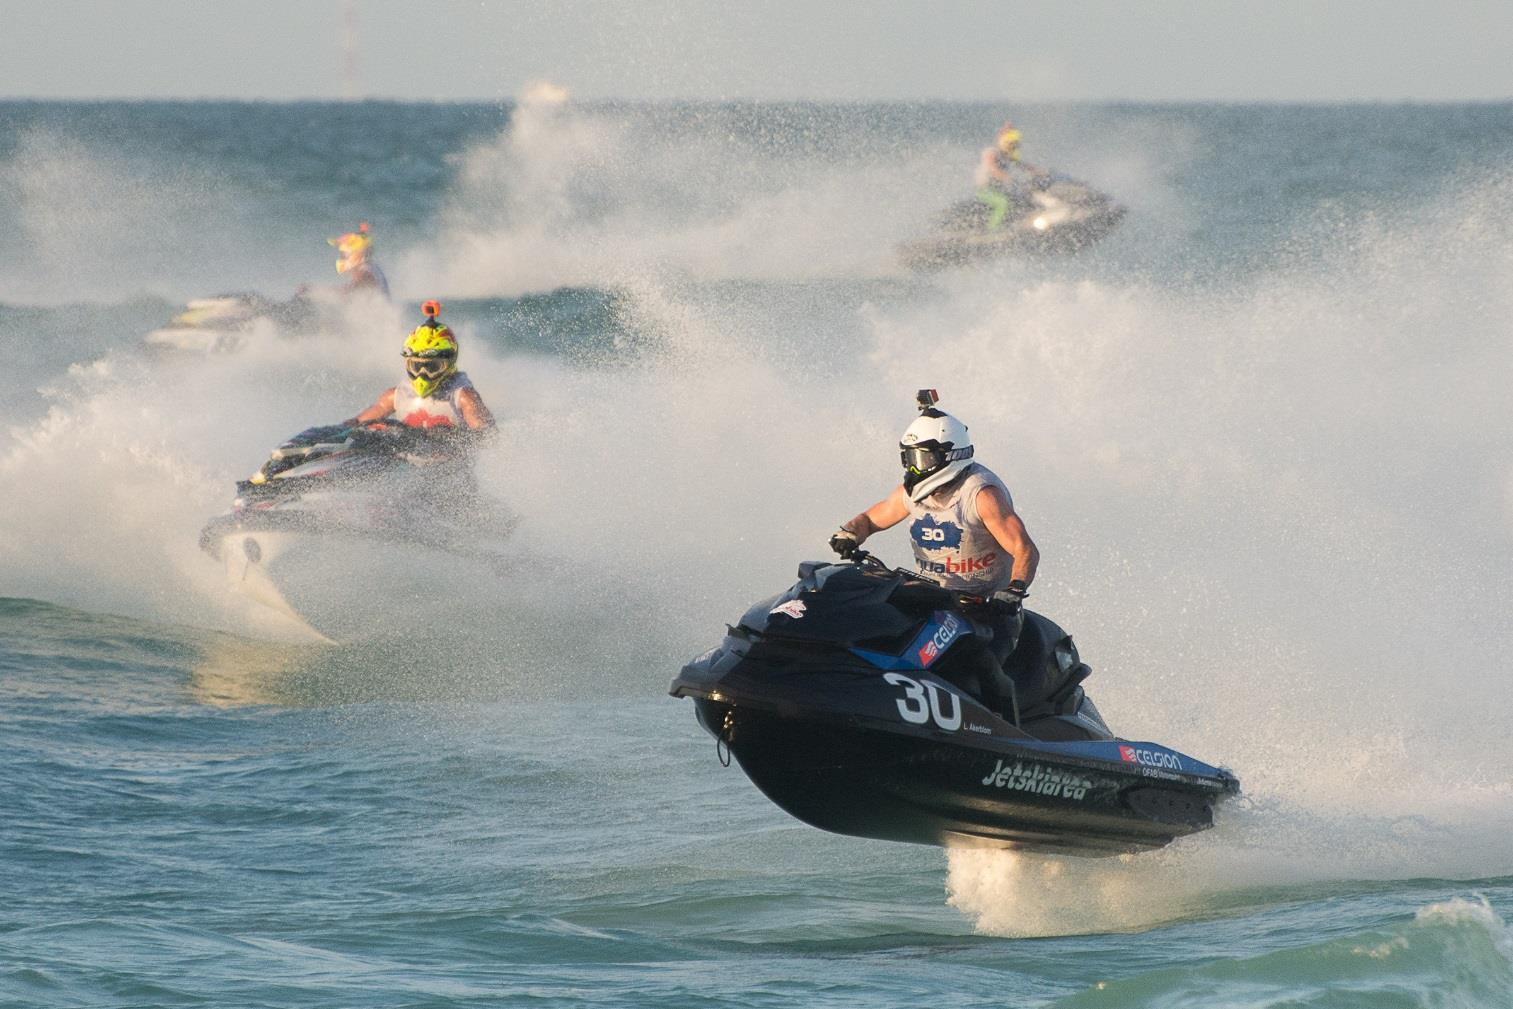 DARIUS OLEJNIK (Poland) UIM-ABP Aquabike Class Runaboat GP1 – Grand Prix of Dubai - 25.11.2017